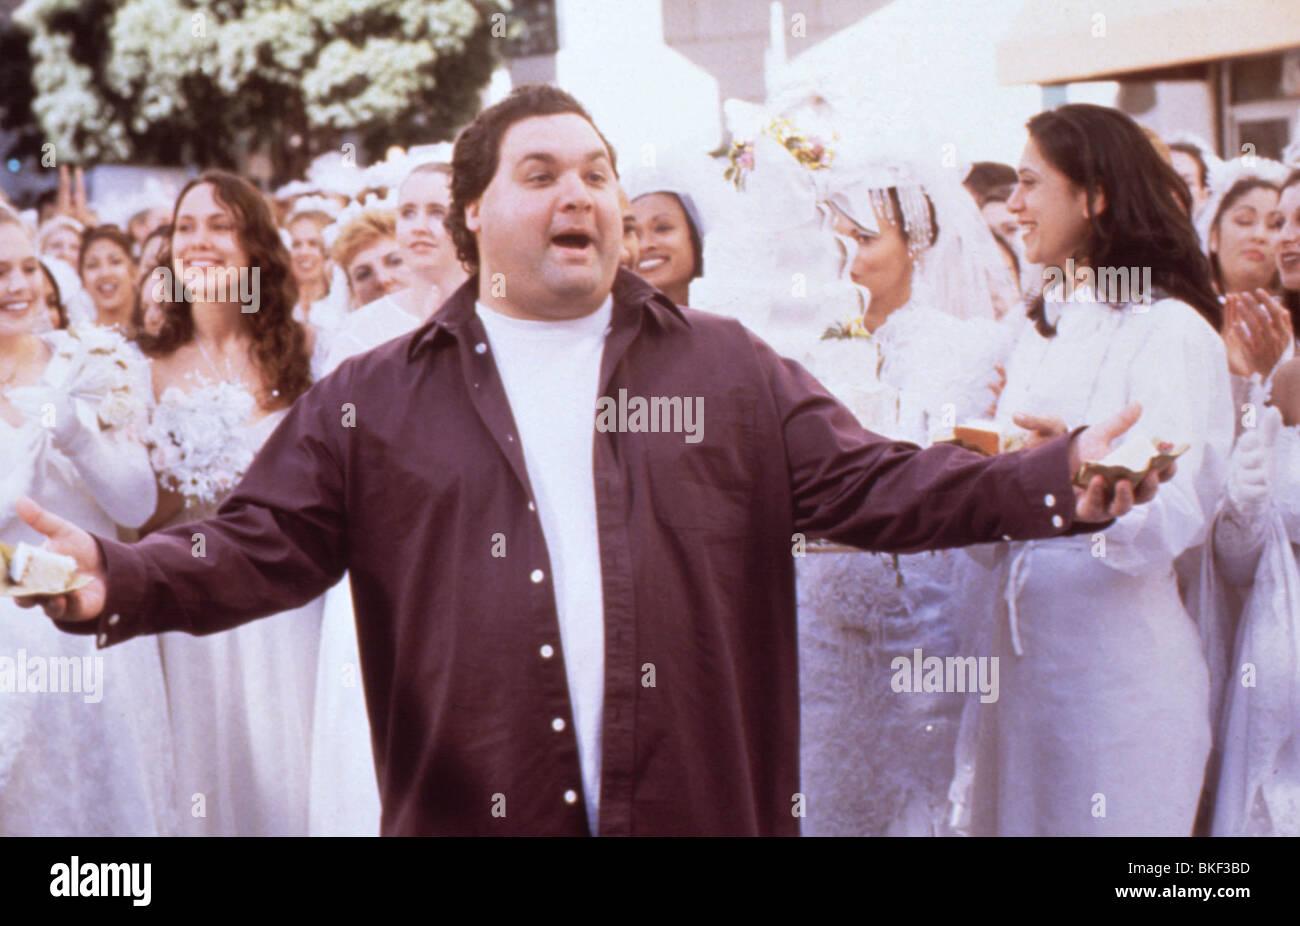 THE BACHELOR -1999 ARTIE LANGE - Stock Image